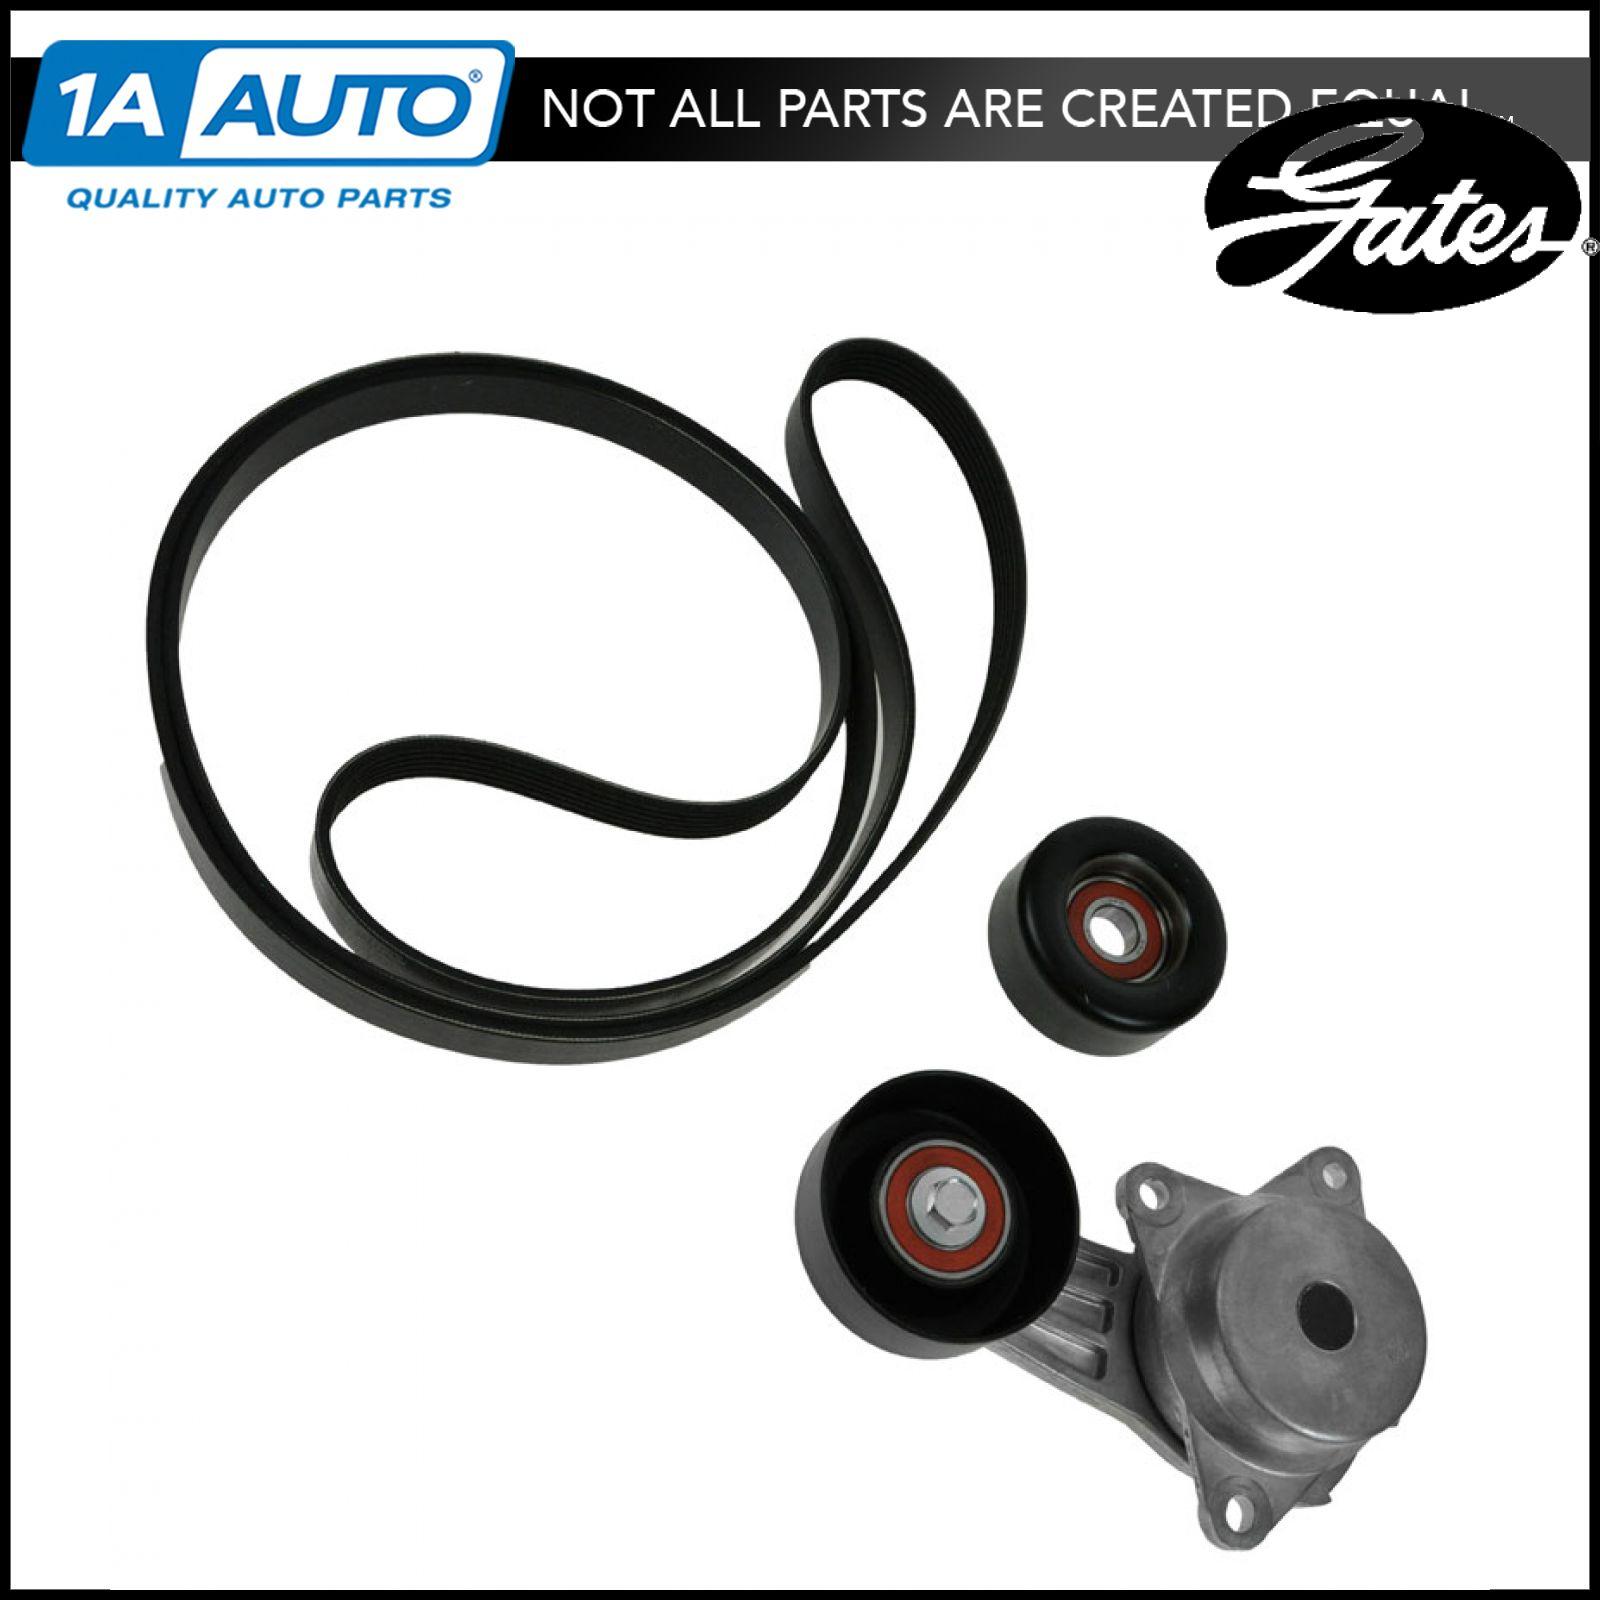 Gates 38408k Belt Idler Tensioner Solutions Kit For 03 05 Mazda 6 2002 626 Mazda6 23